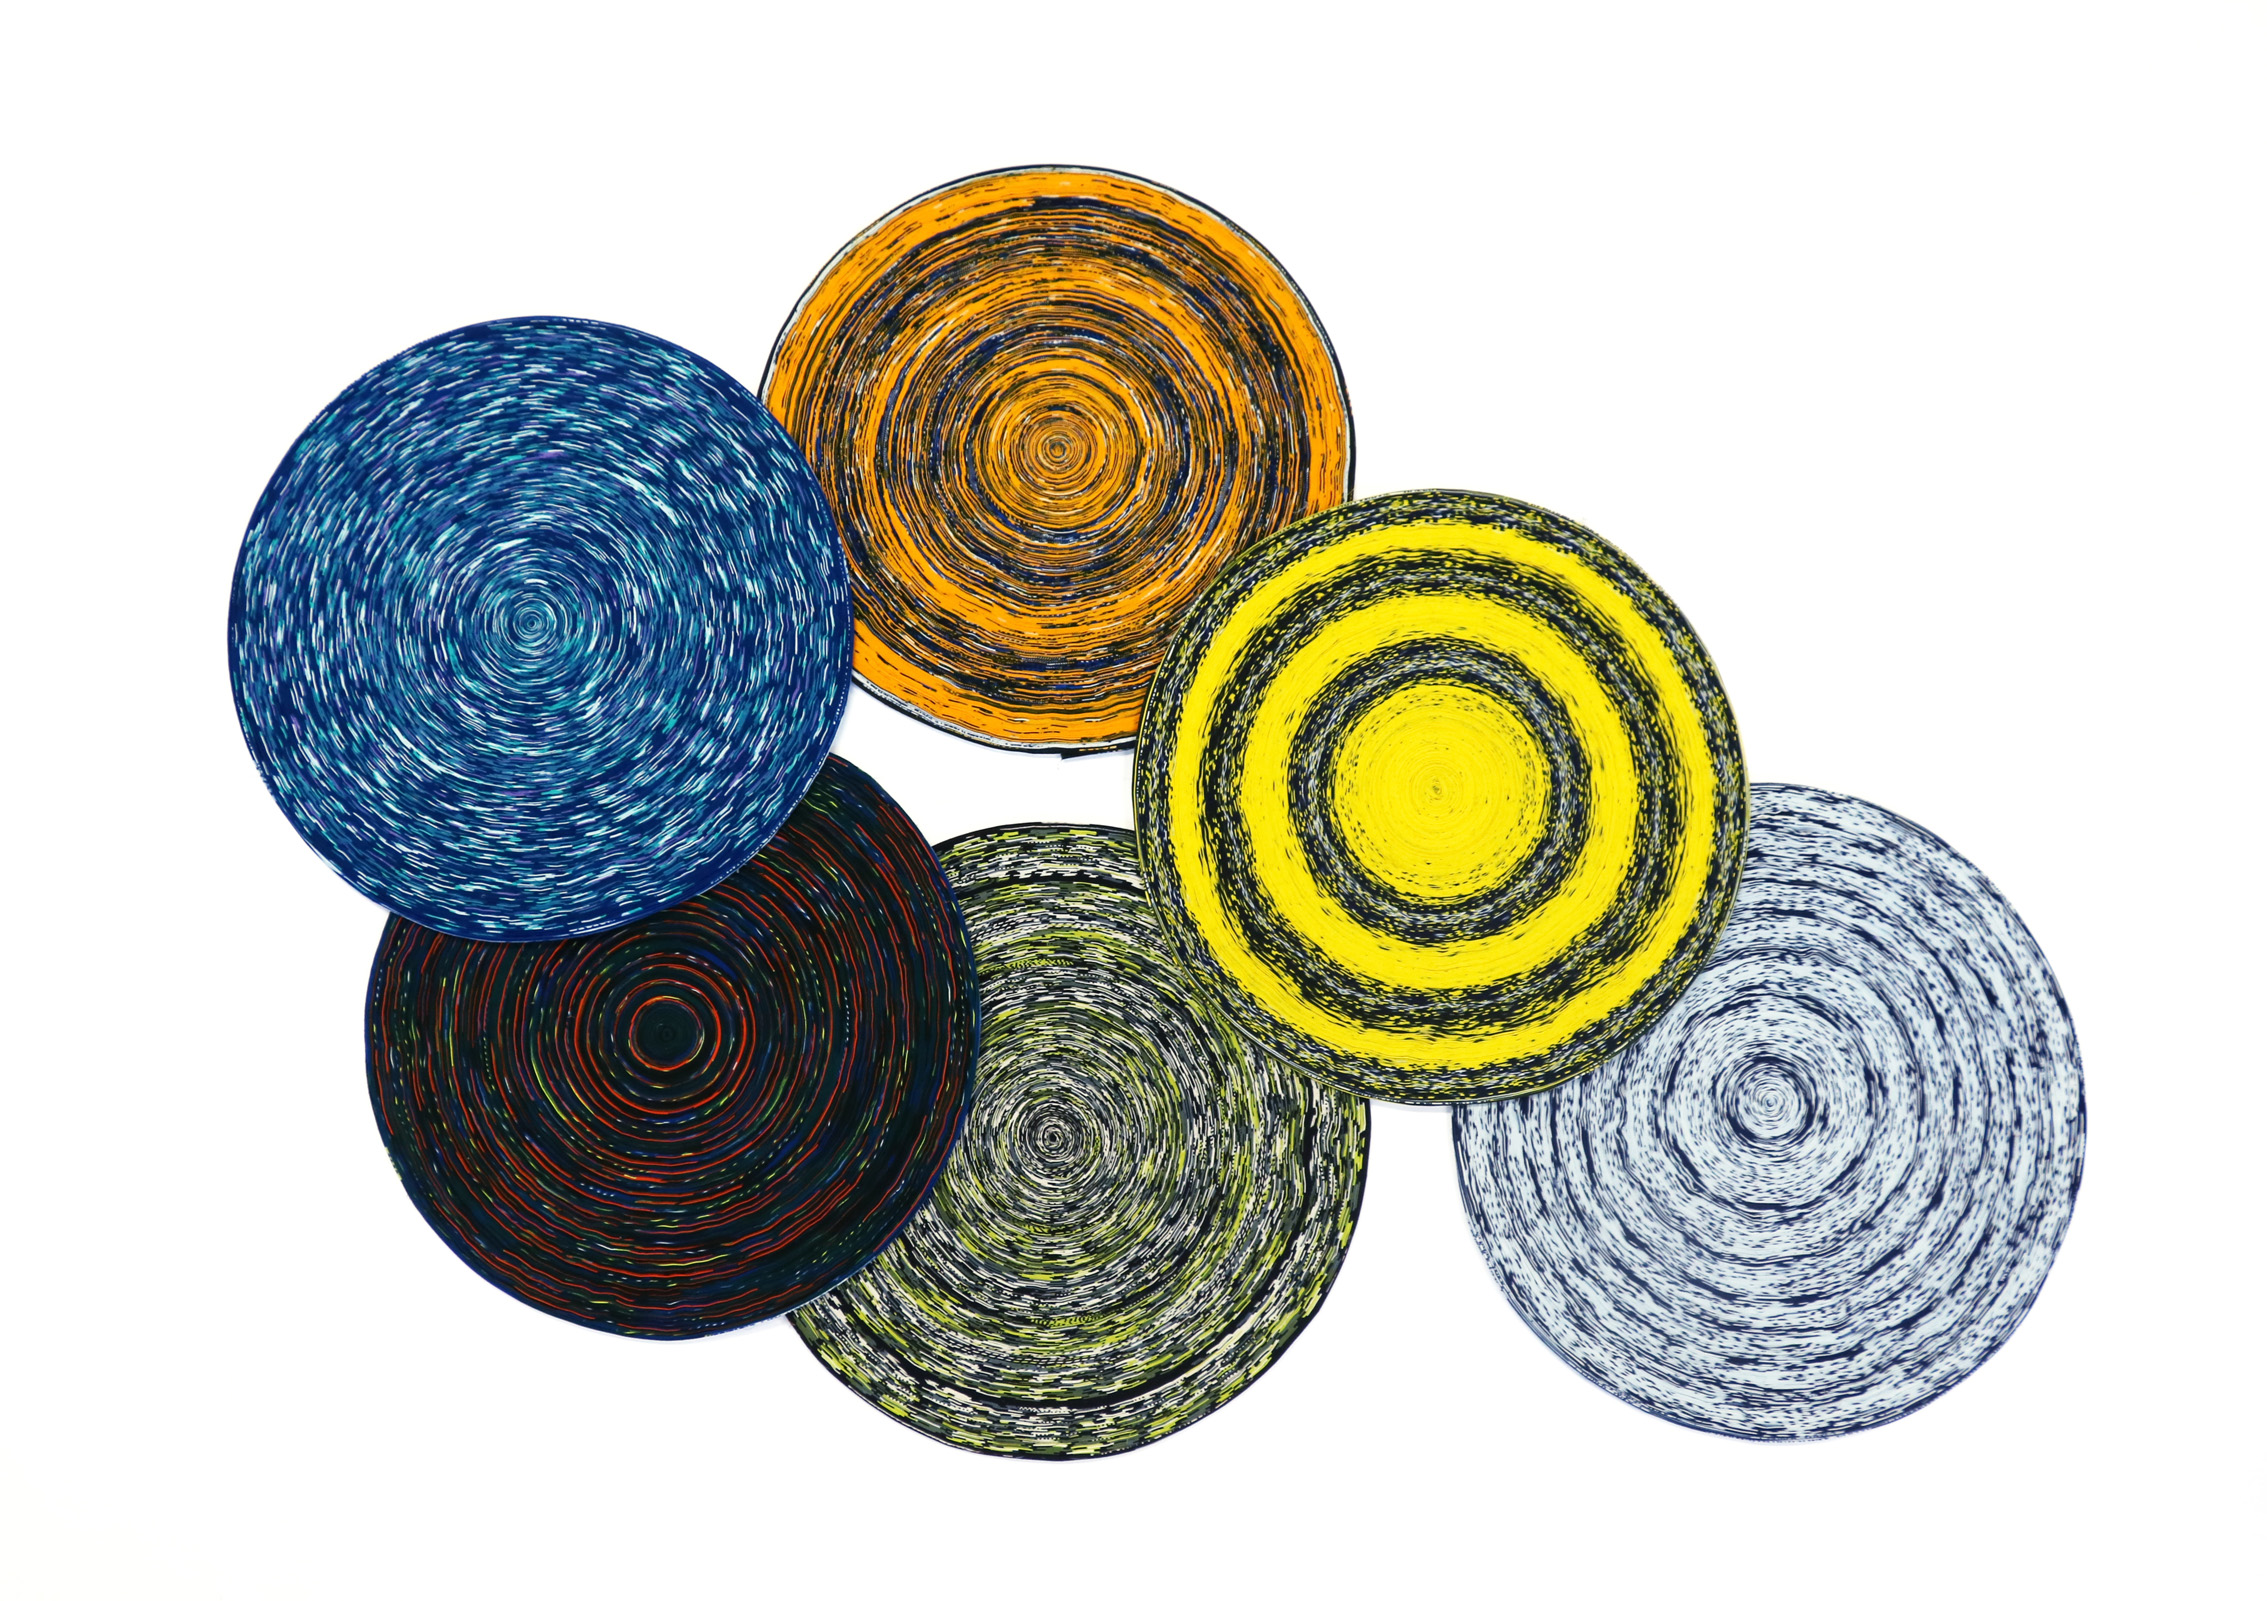 c3ee0723e415-SimonePost_Coloursamples_compositionfree_vliscorecycledcarpet.jpg